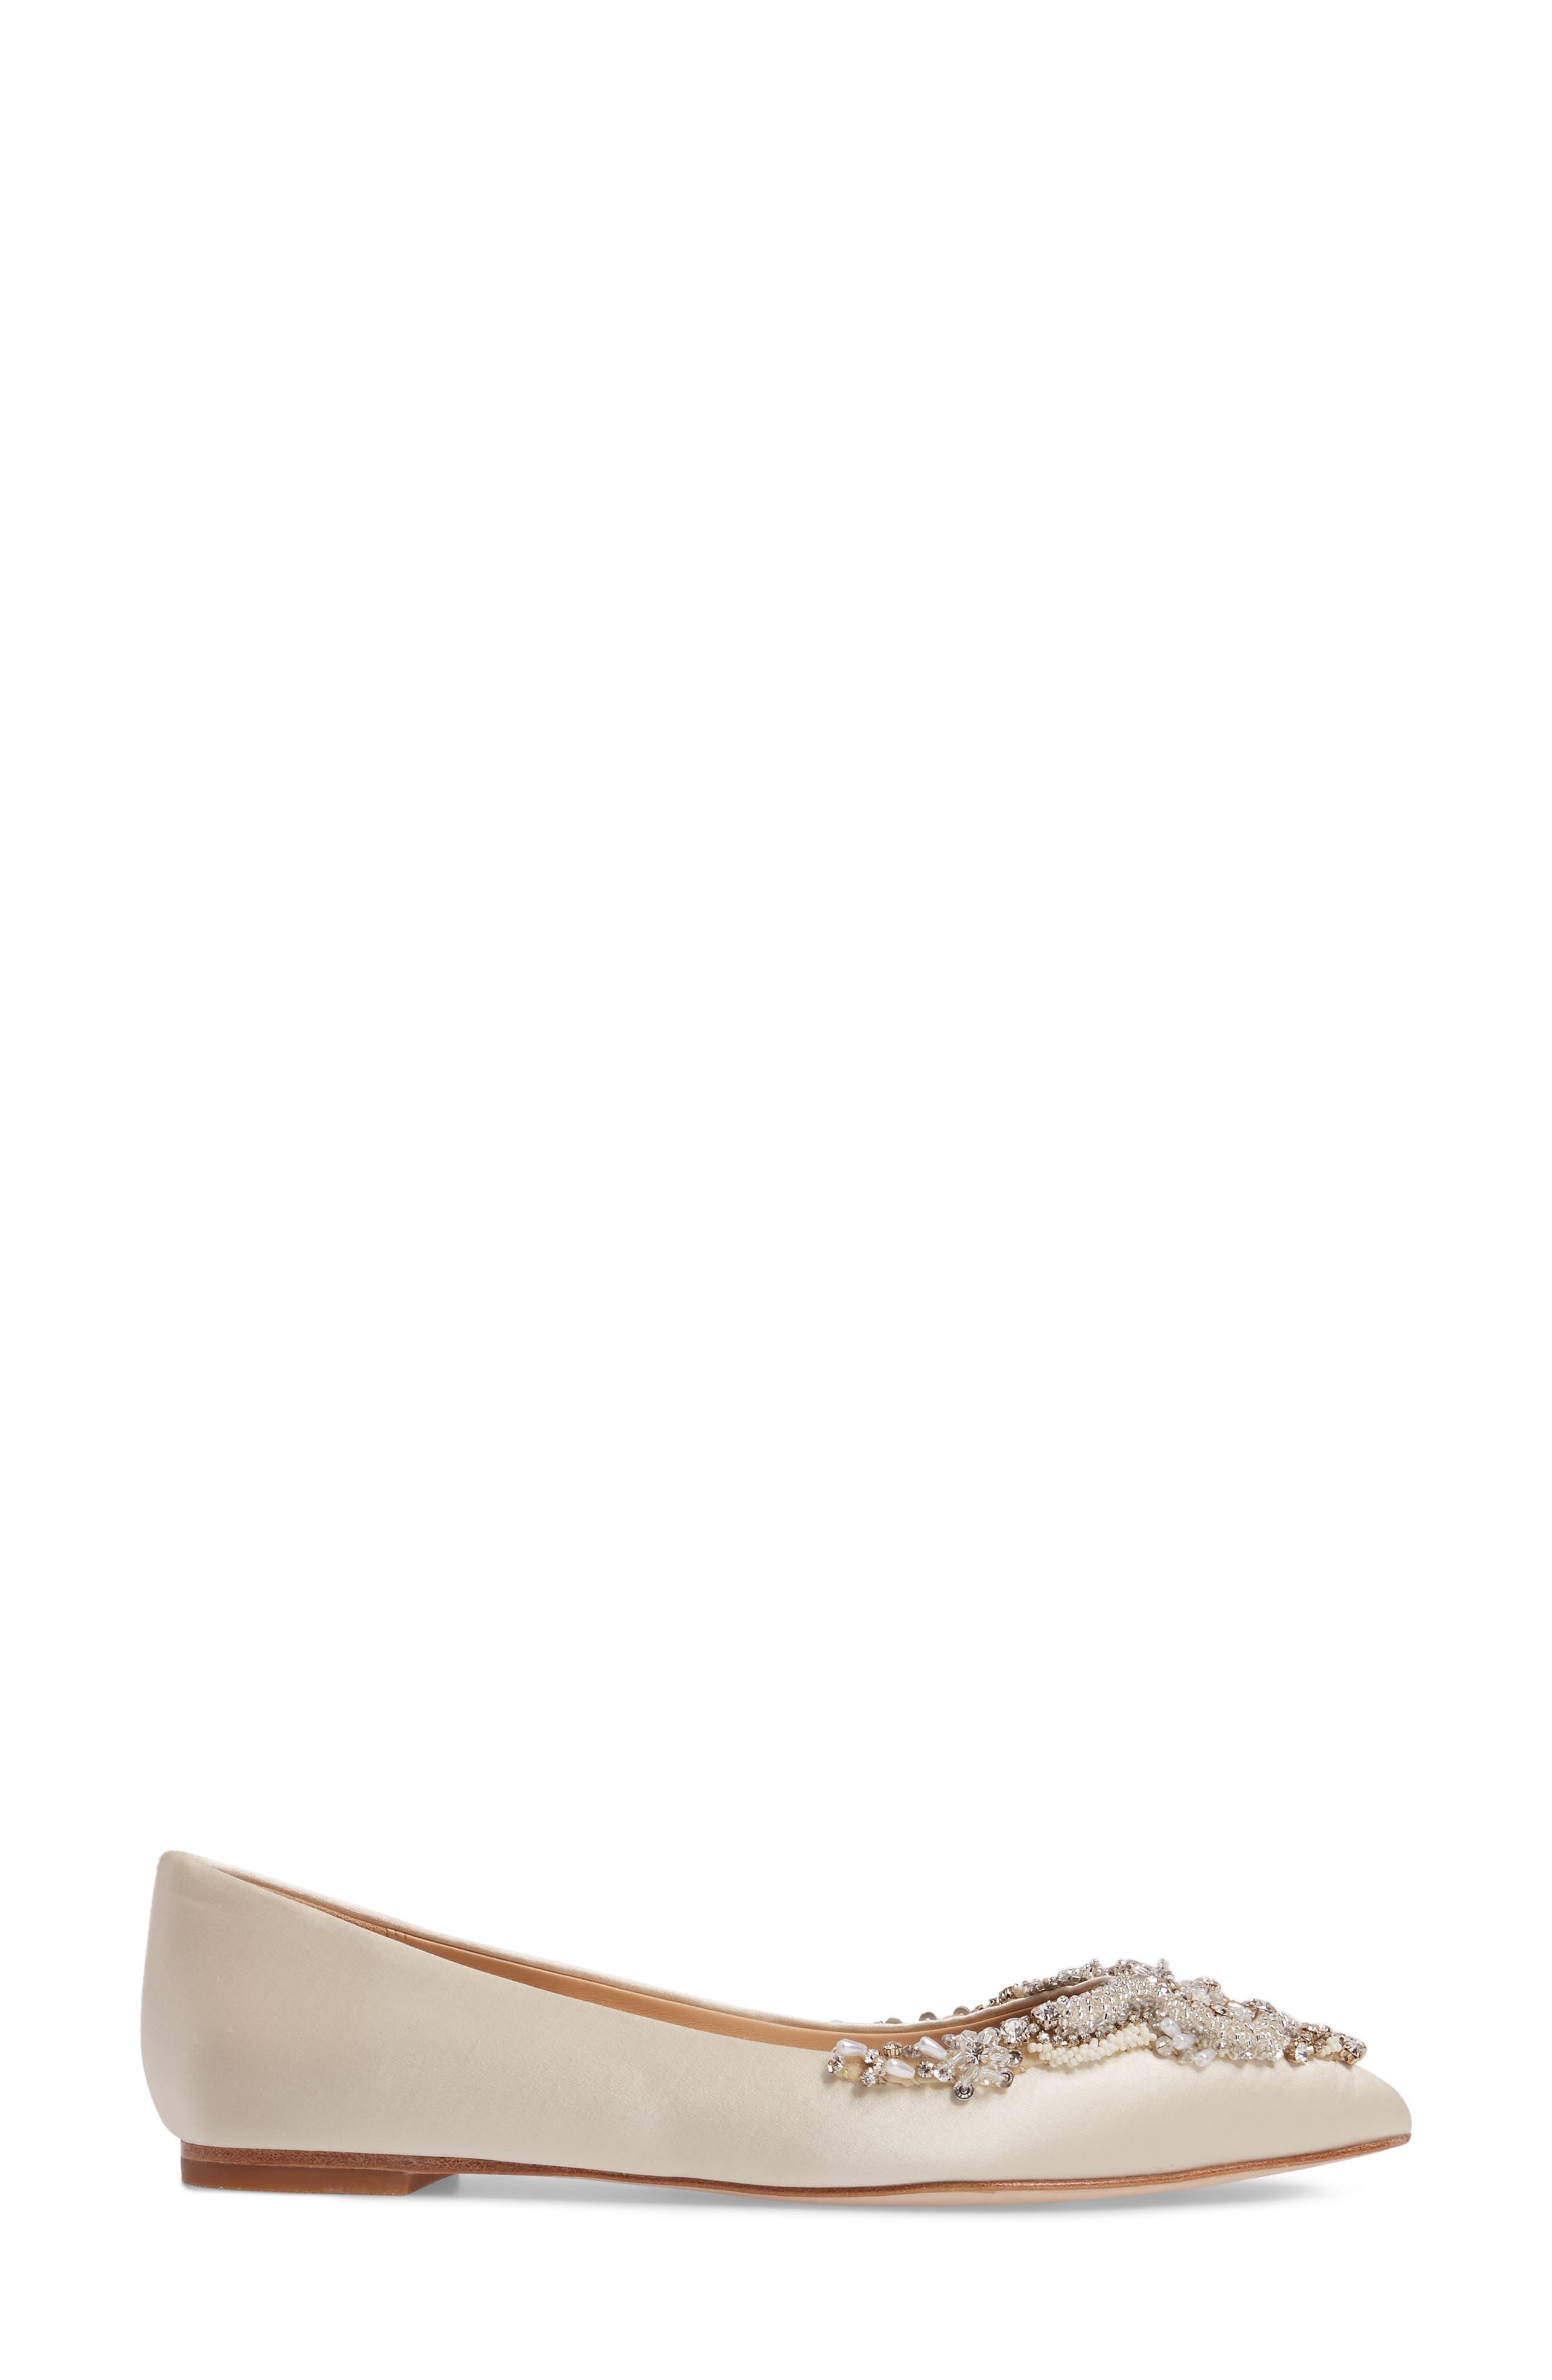 ,                             Badgley Mischka Malena Embellished Flat,                             Alternate thumbnail 15, color,                             900